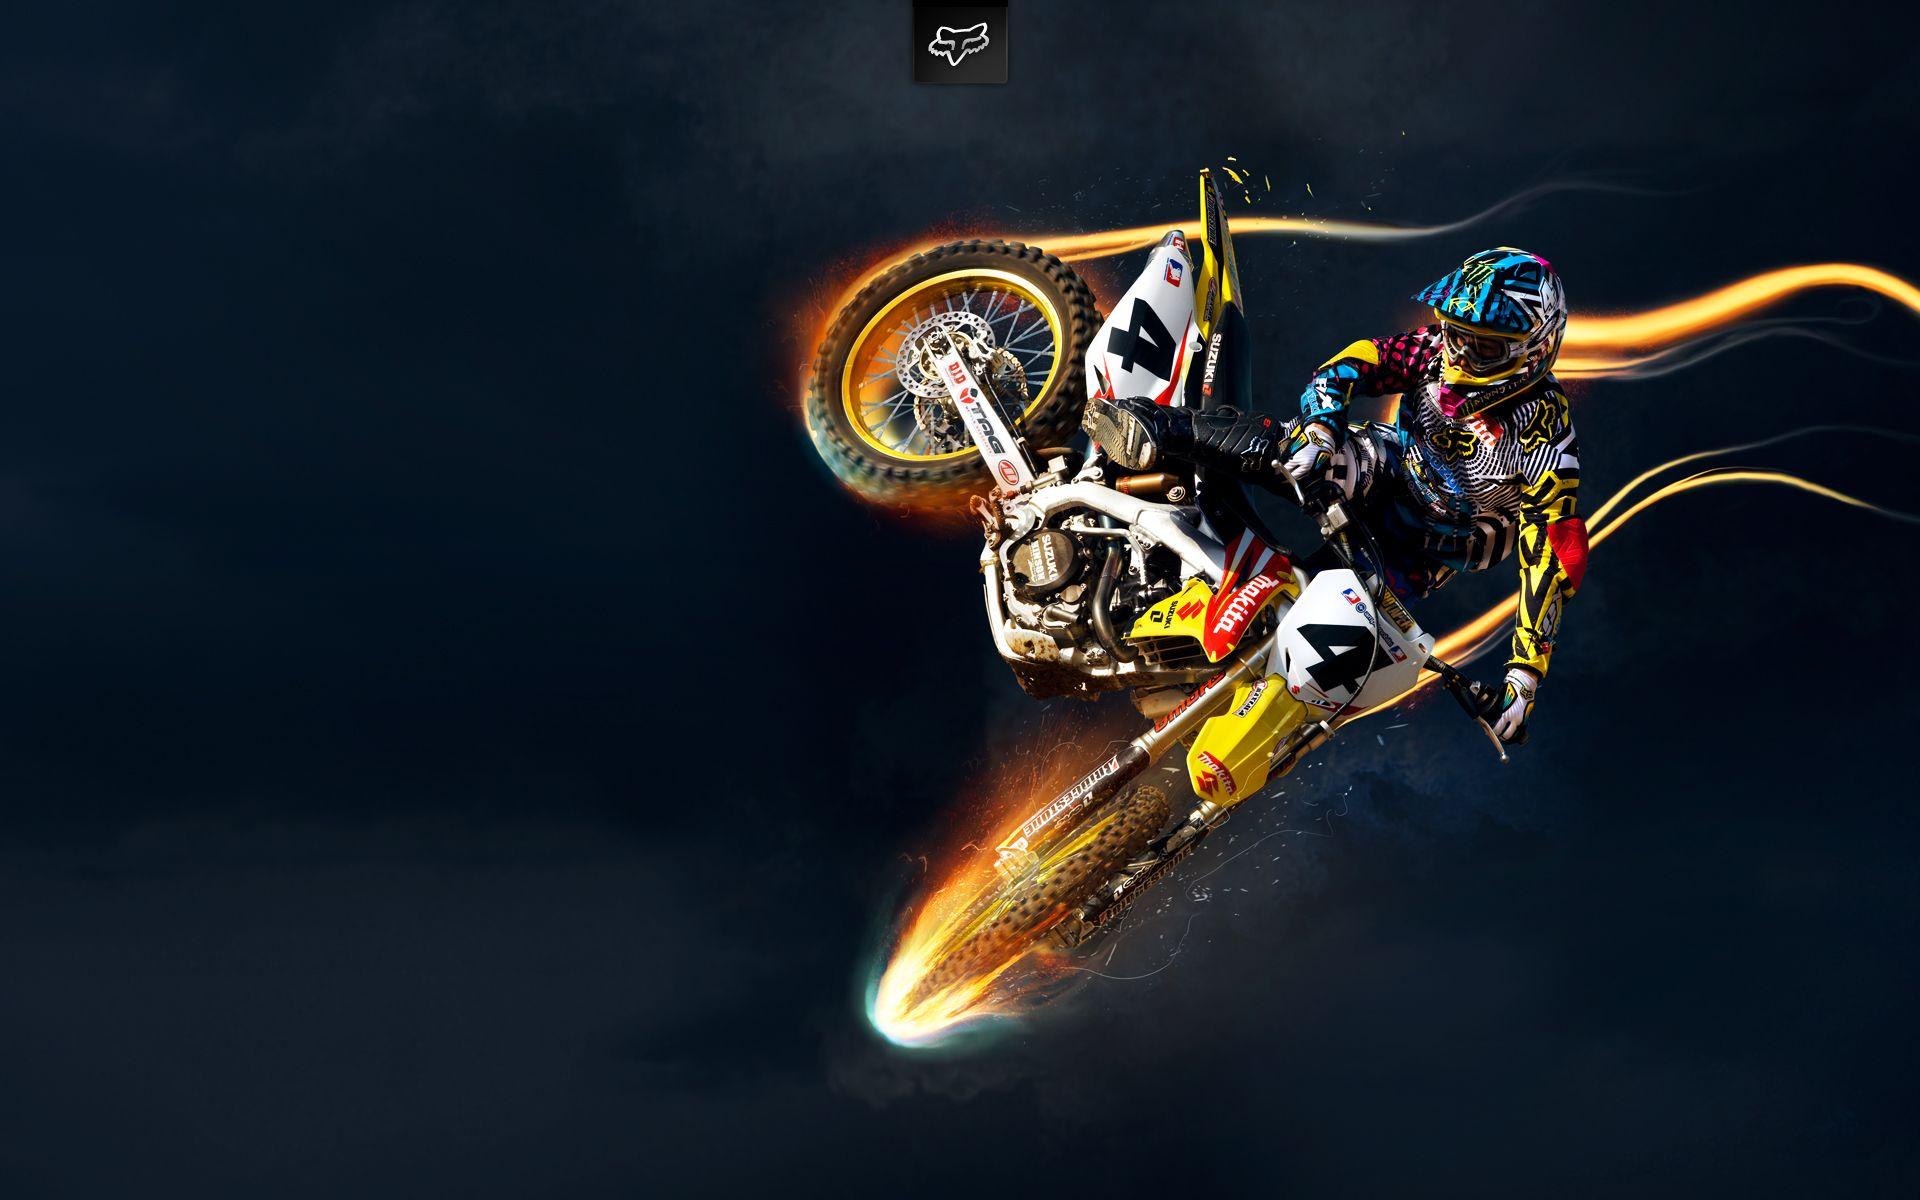 Ricky Carmichael Suzuki Motocross Motocross Cool Dirt Bikes